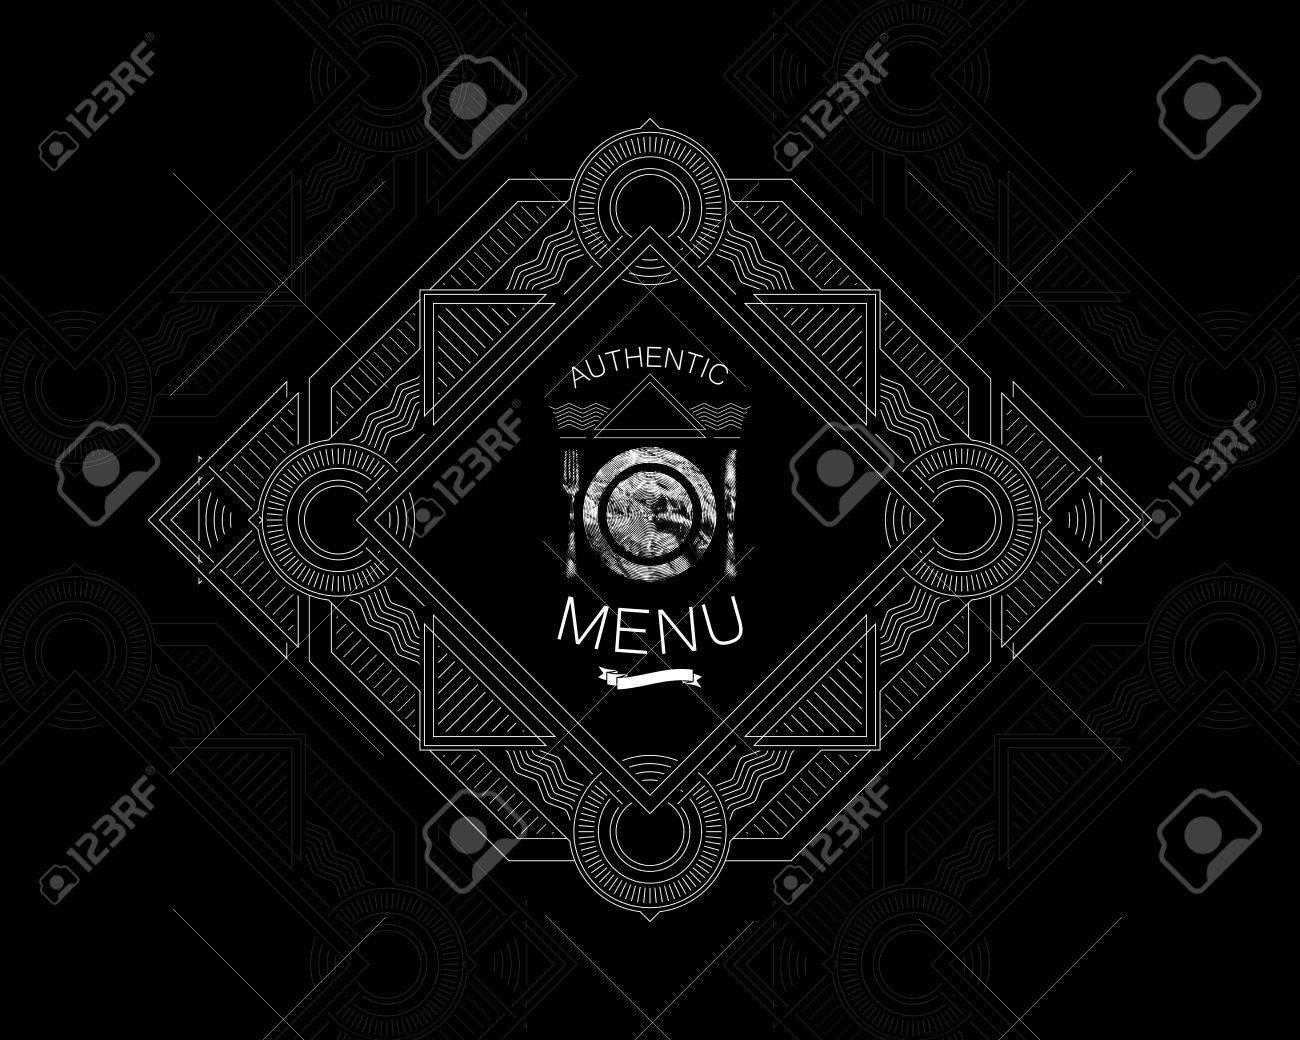 Vektor illustration mit kunstvollen restaurant menü label